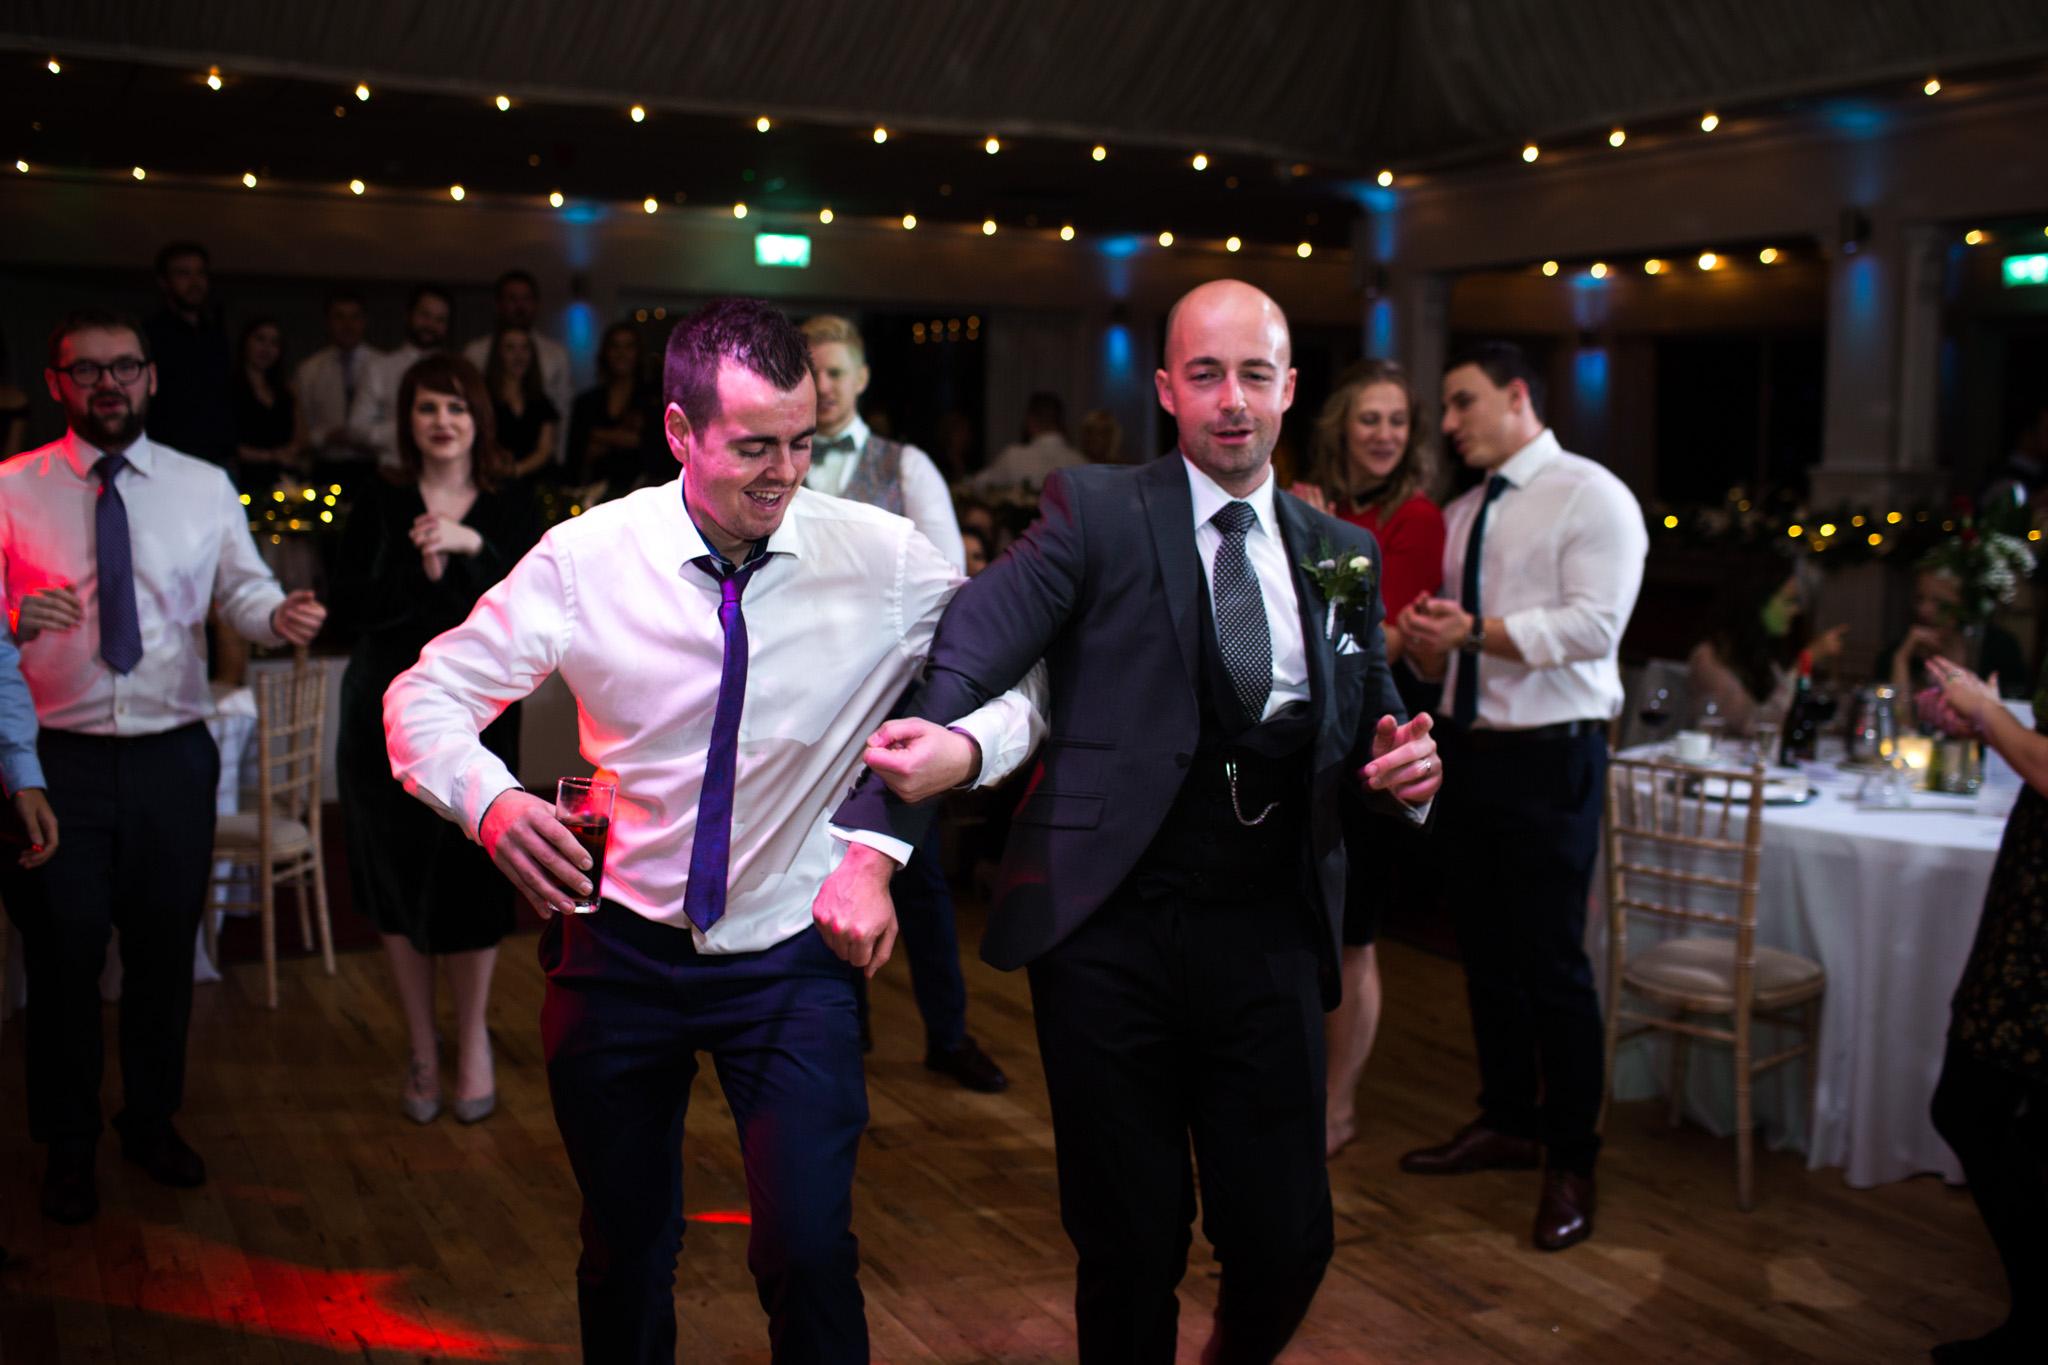 Mark_Barnes_Northern_Ireland_wedding_photographer_Harveys_Point_Donegall_Wedding_photography-Adam&Gemma-68.jpg